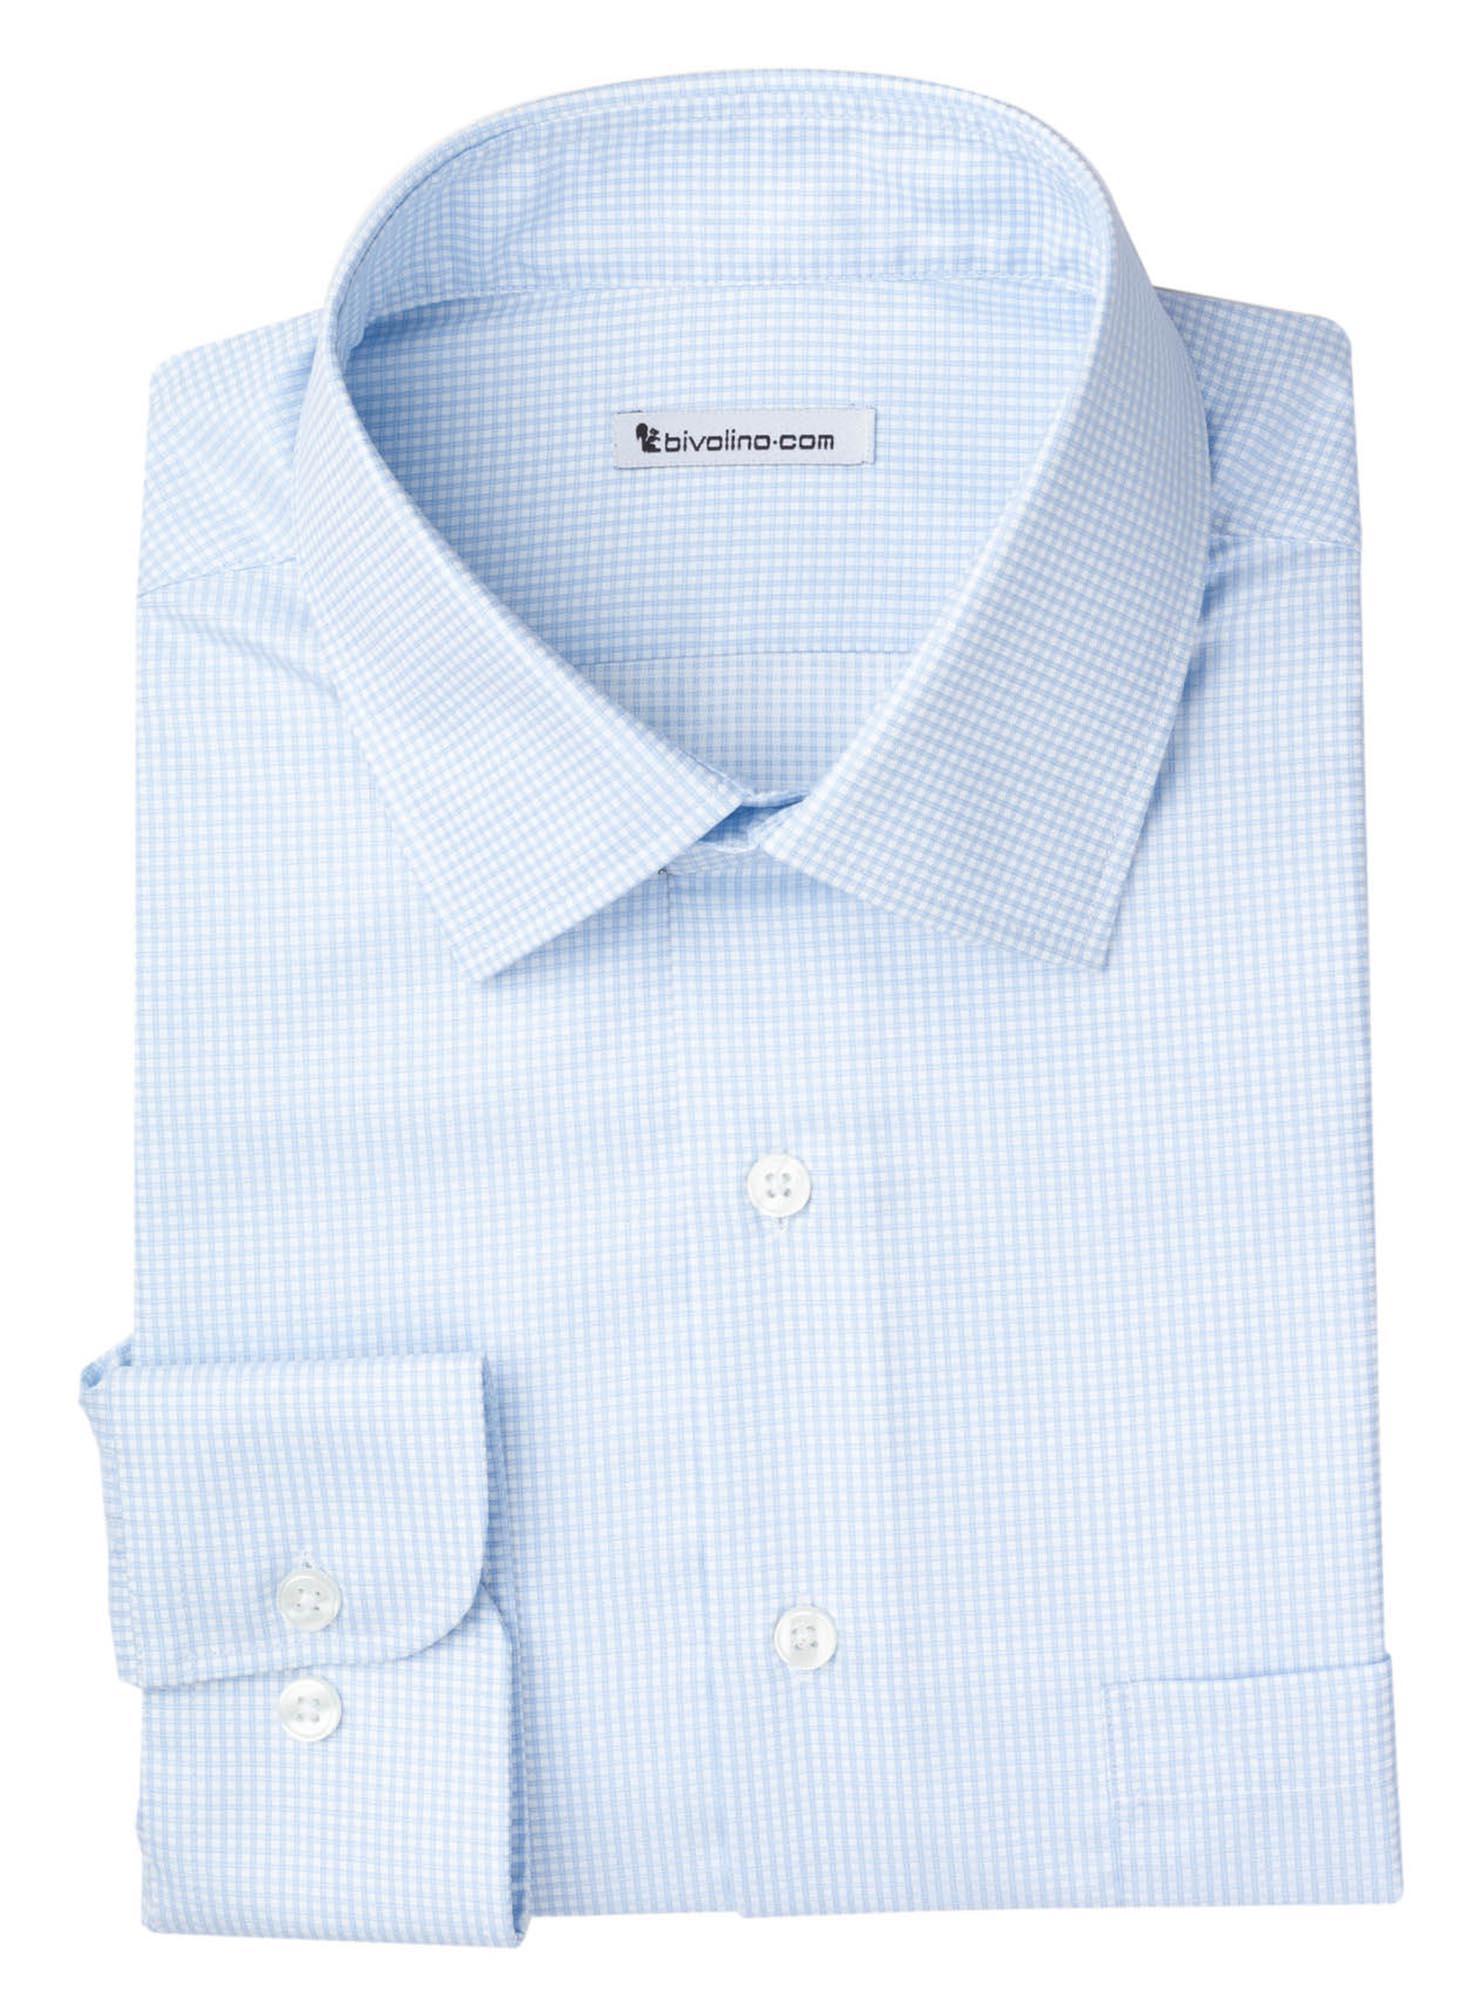 PALLONI  - Men's shrt cotton supima blue check - DARCi 1